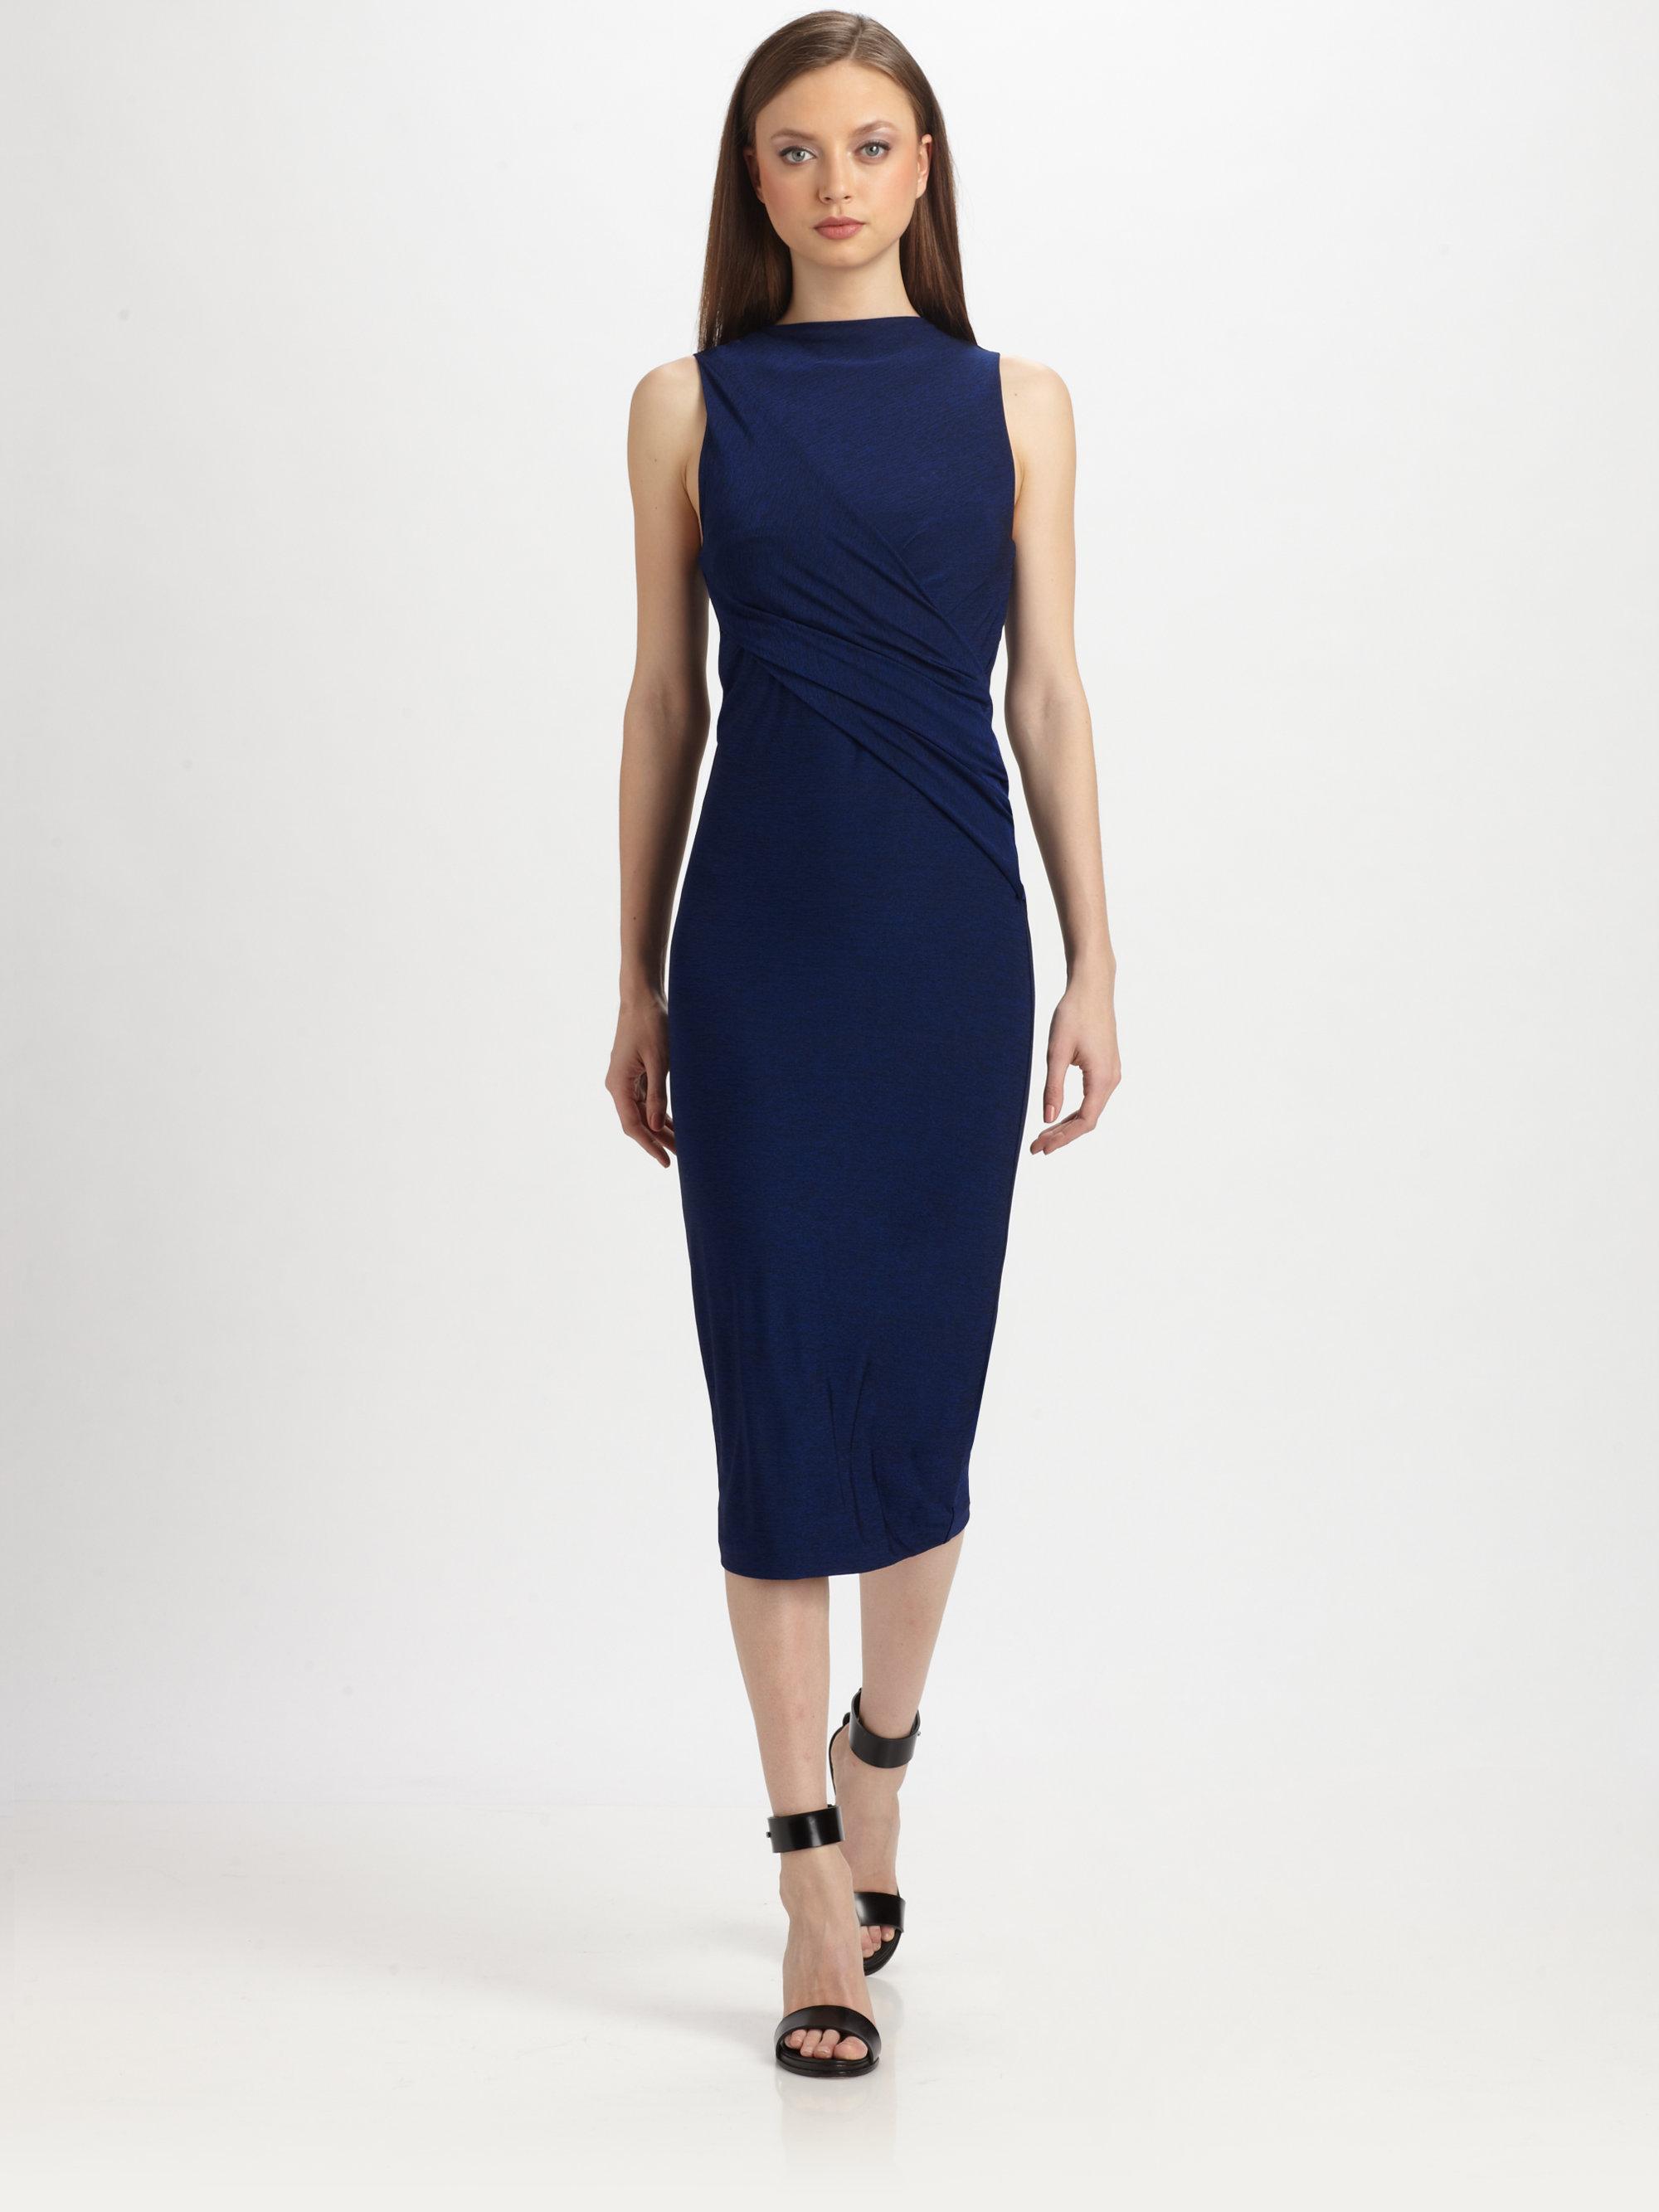 3e8b4a64337 T By Alexander Wang Draped Stretch Jersey Dress in Blue - Lyst